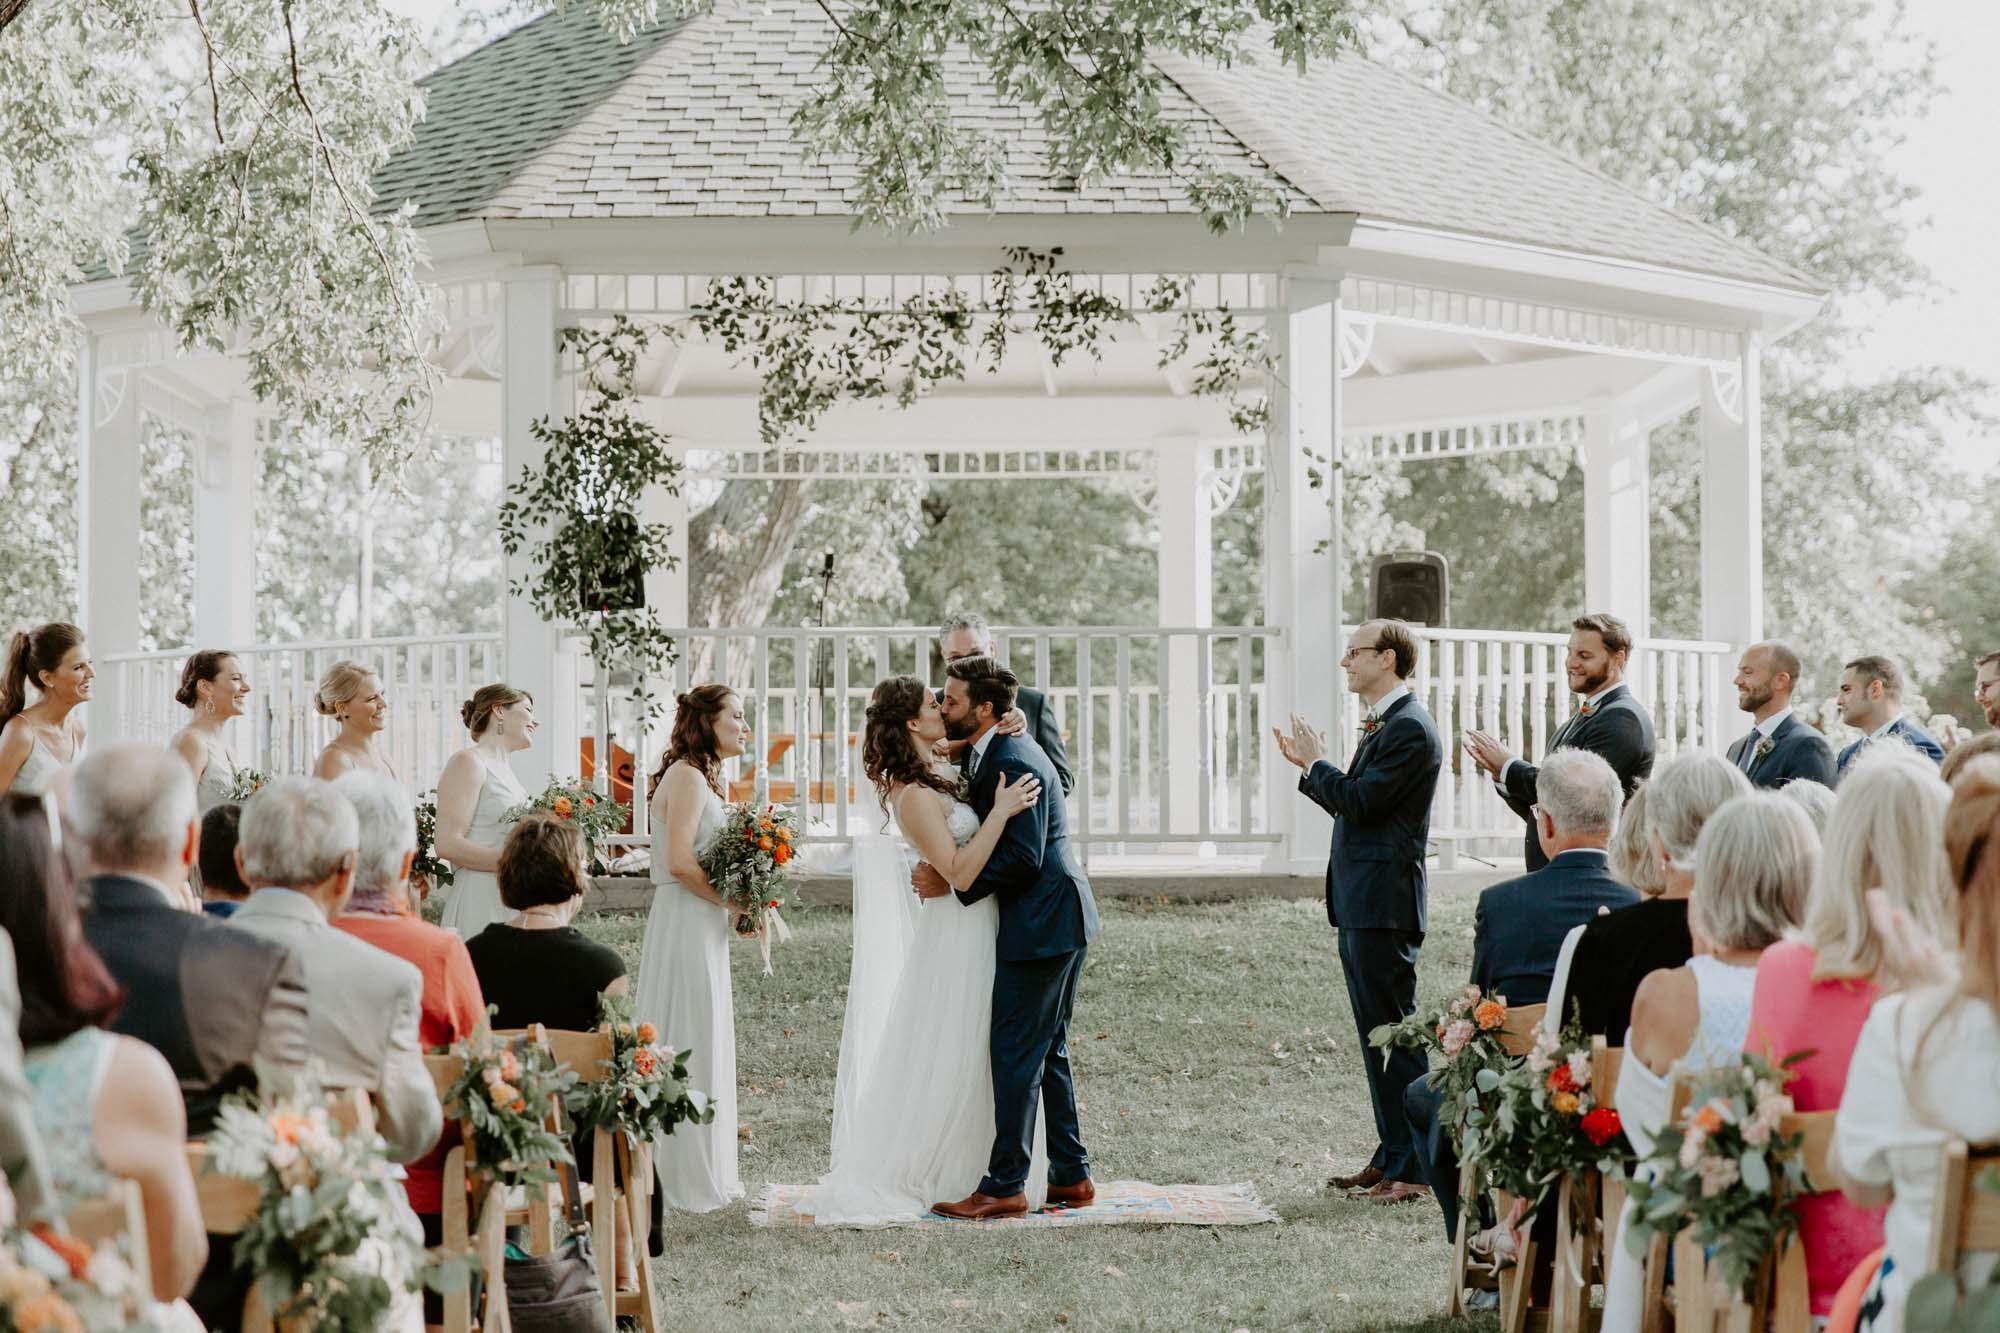 journeyman_distillery_wedding_photographer_chicago_il_wright_photographs-6500.jpg